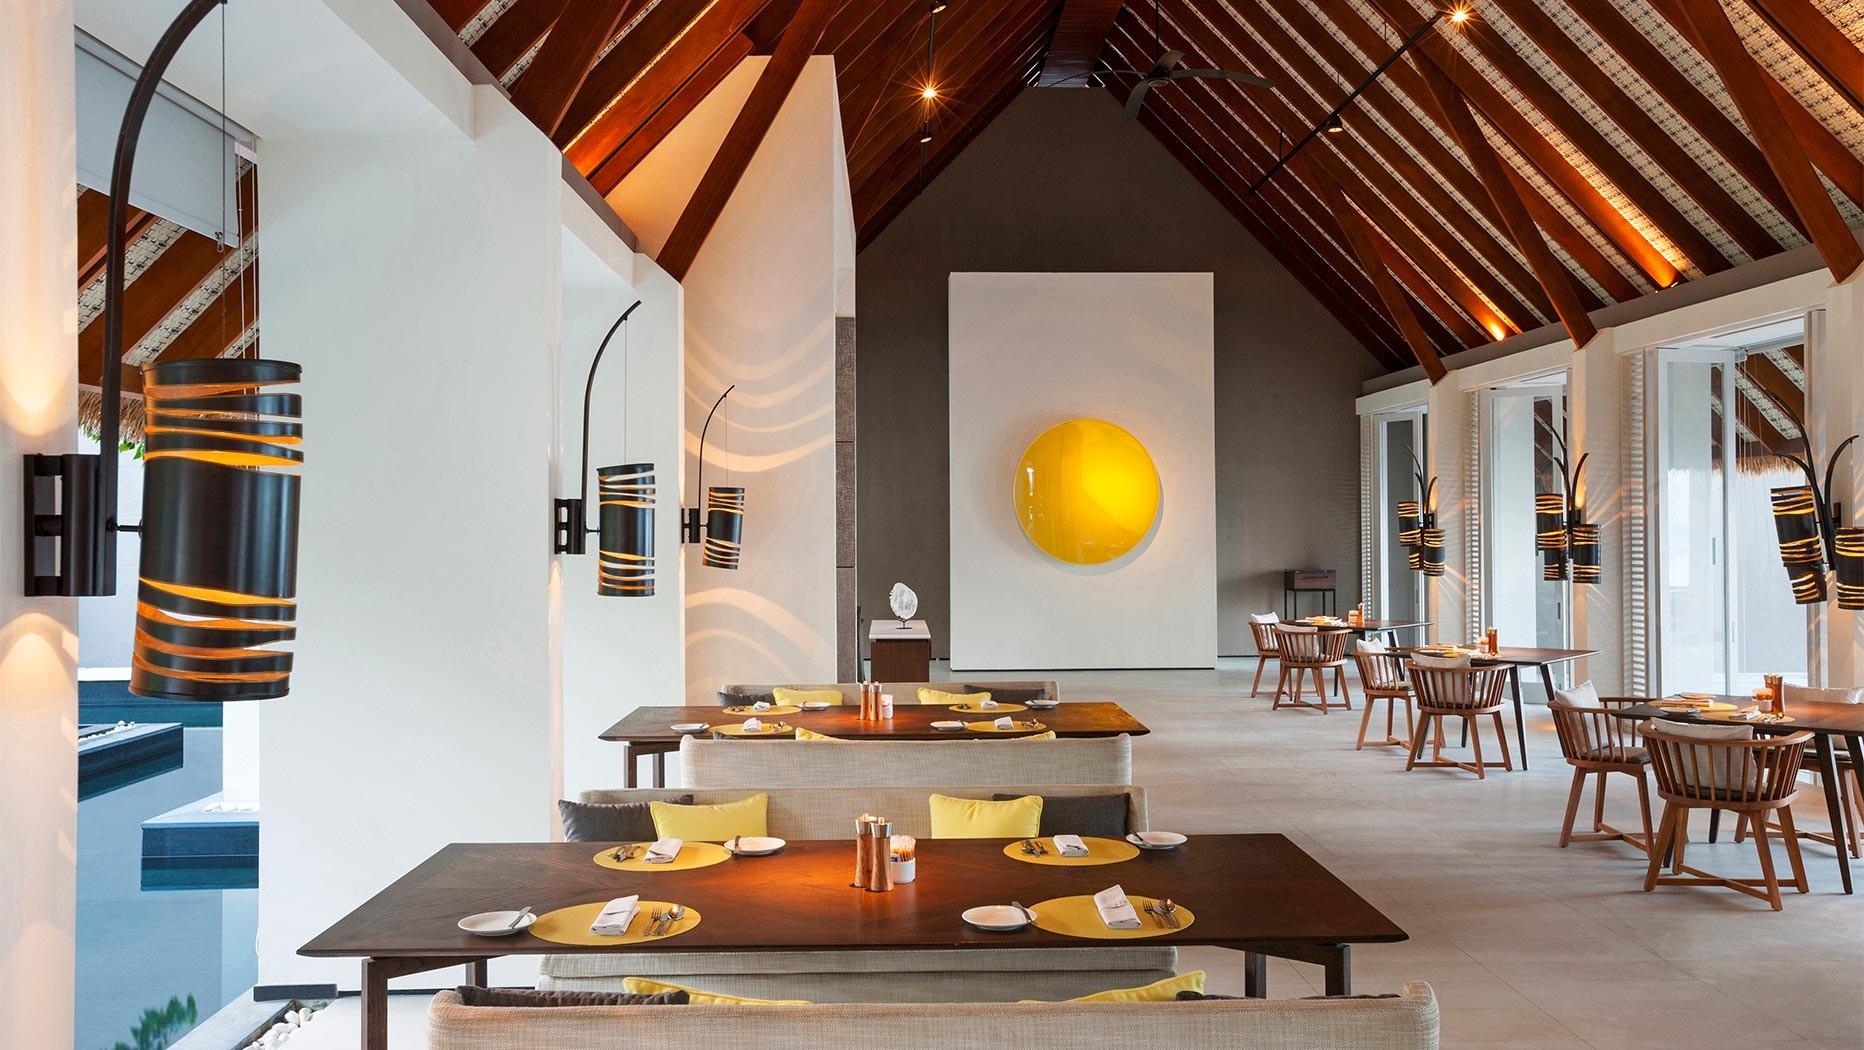 https://www.otdesign.com/wp-content/uploads/2020/11/OTdesign_Cheval_Blanc_Randheli_-the-white-restaurant.jpg